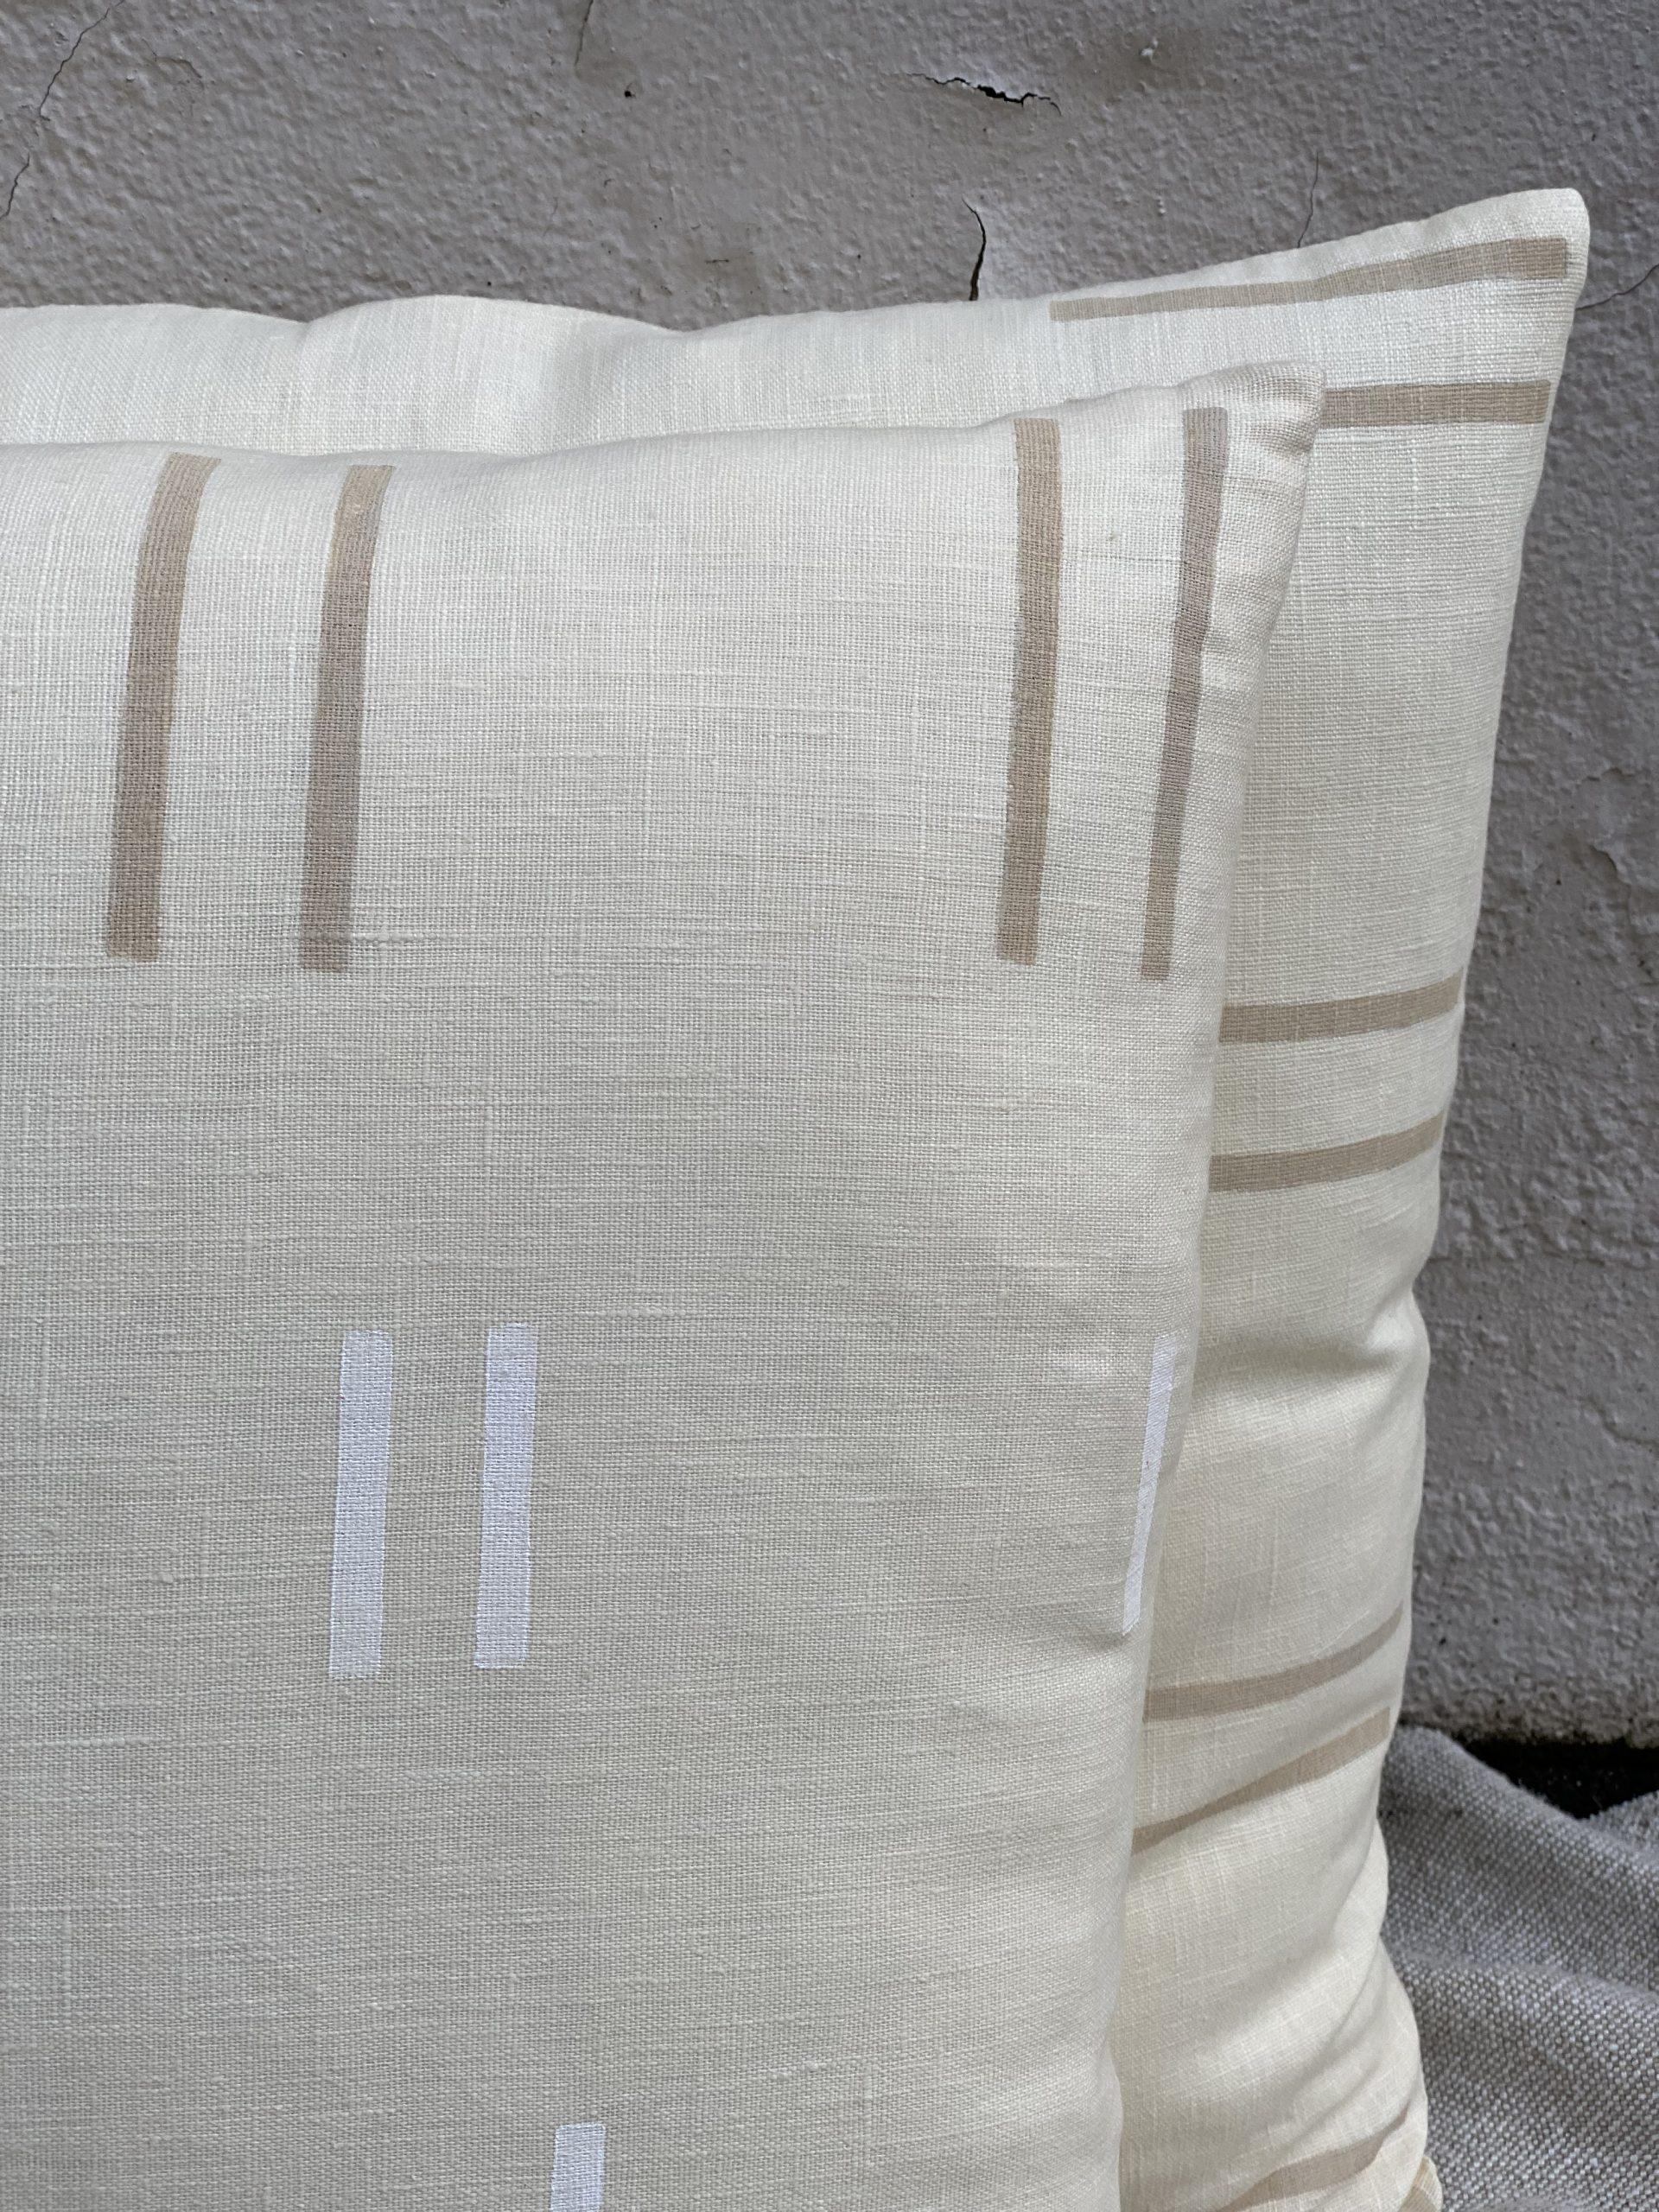 Caroline Hurley Pillows